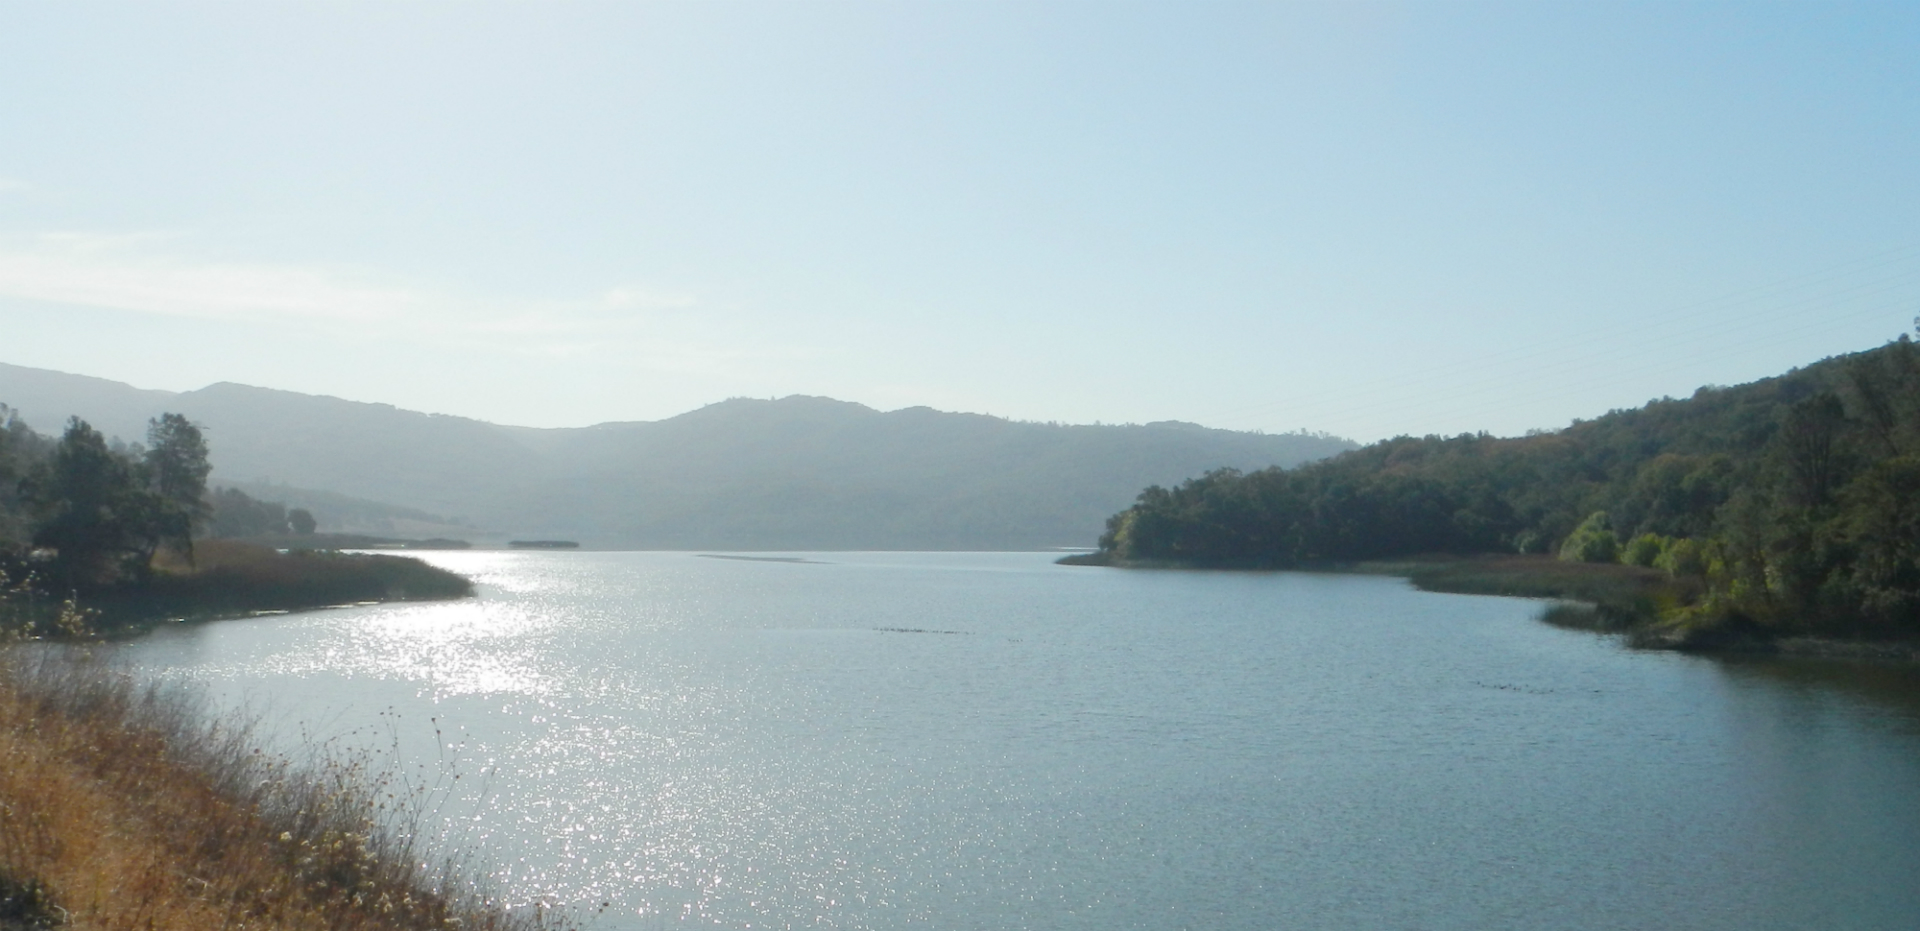 Lake Hennessey - Napa County, CA